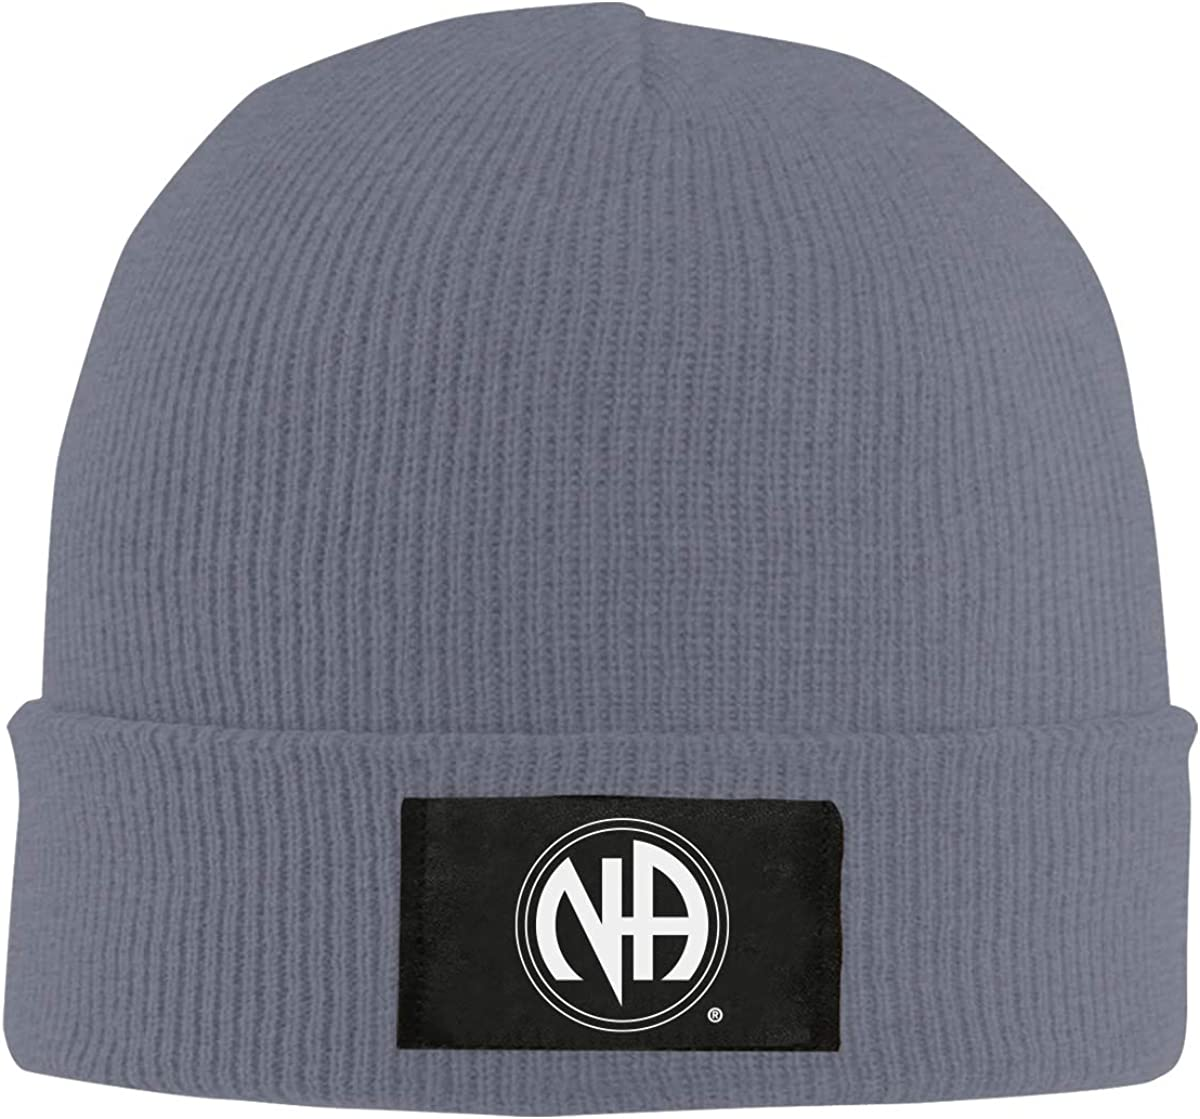 HUbGO Design Unisex Men Women Winter Na Logo Knit Hat Black